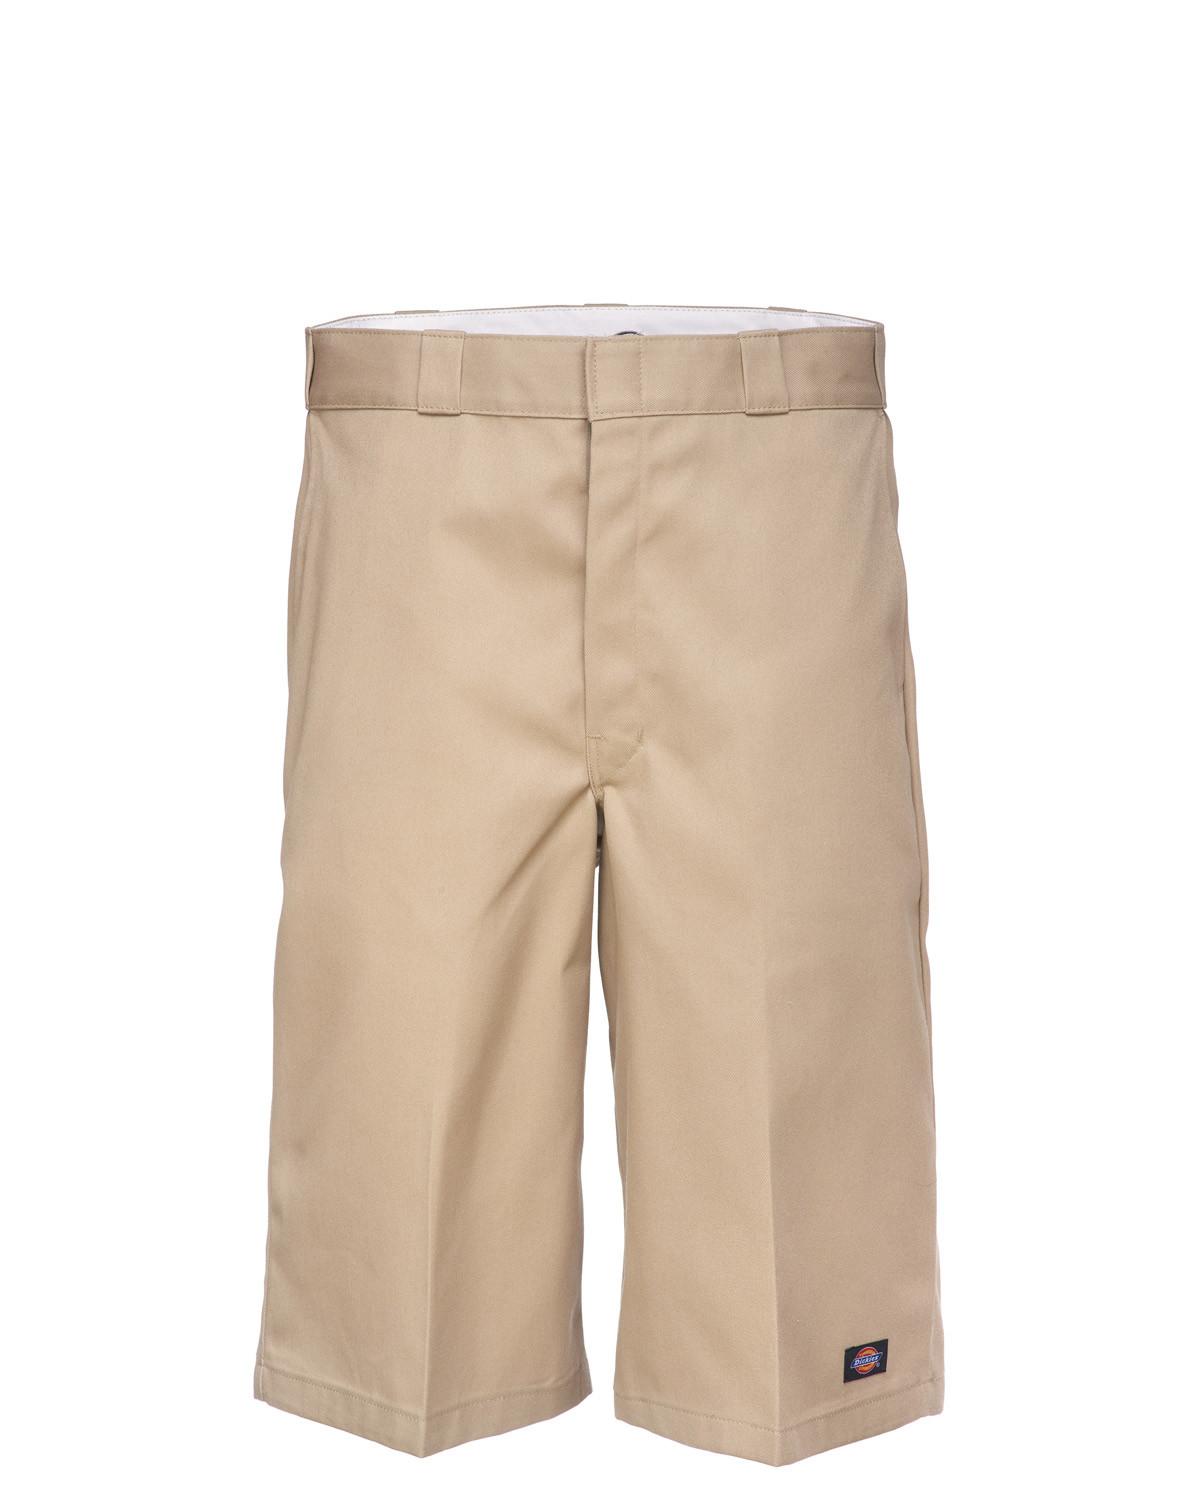 "Dickies Shorts 15"" Multi Pocket (Khaki, W44)"